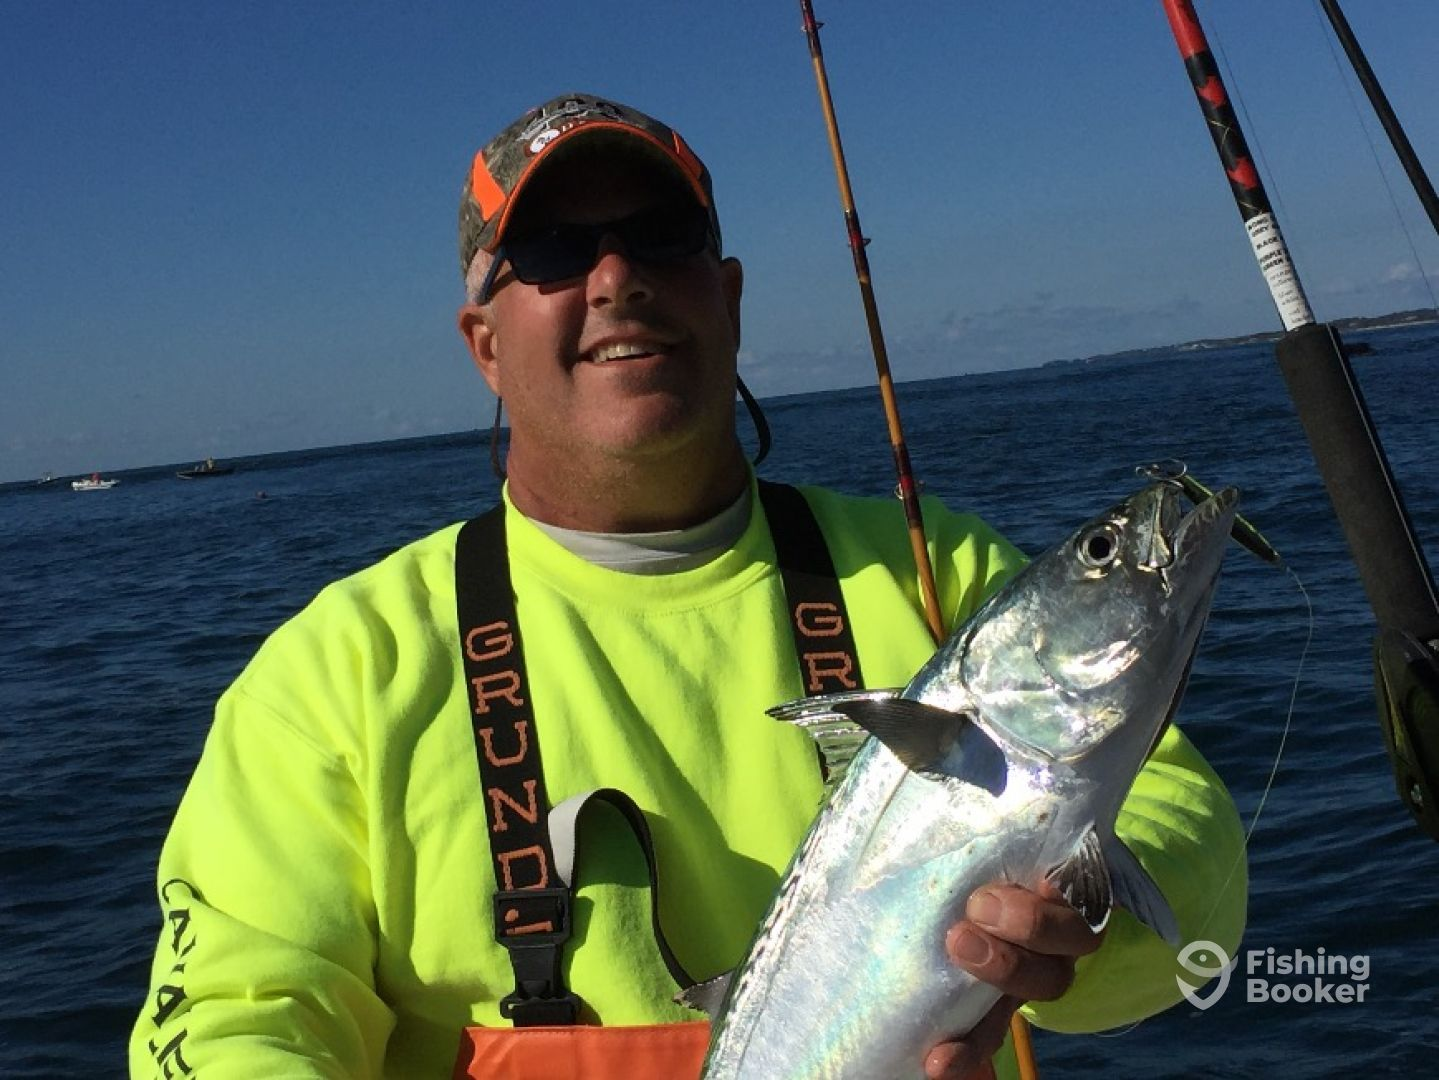 Road work ahead fishing charters stamford ct fishingbooker for Fishing charters ct